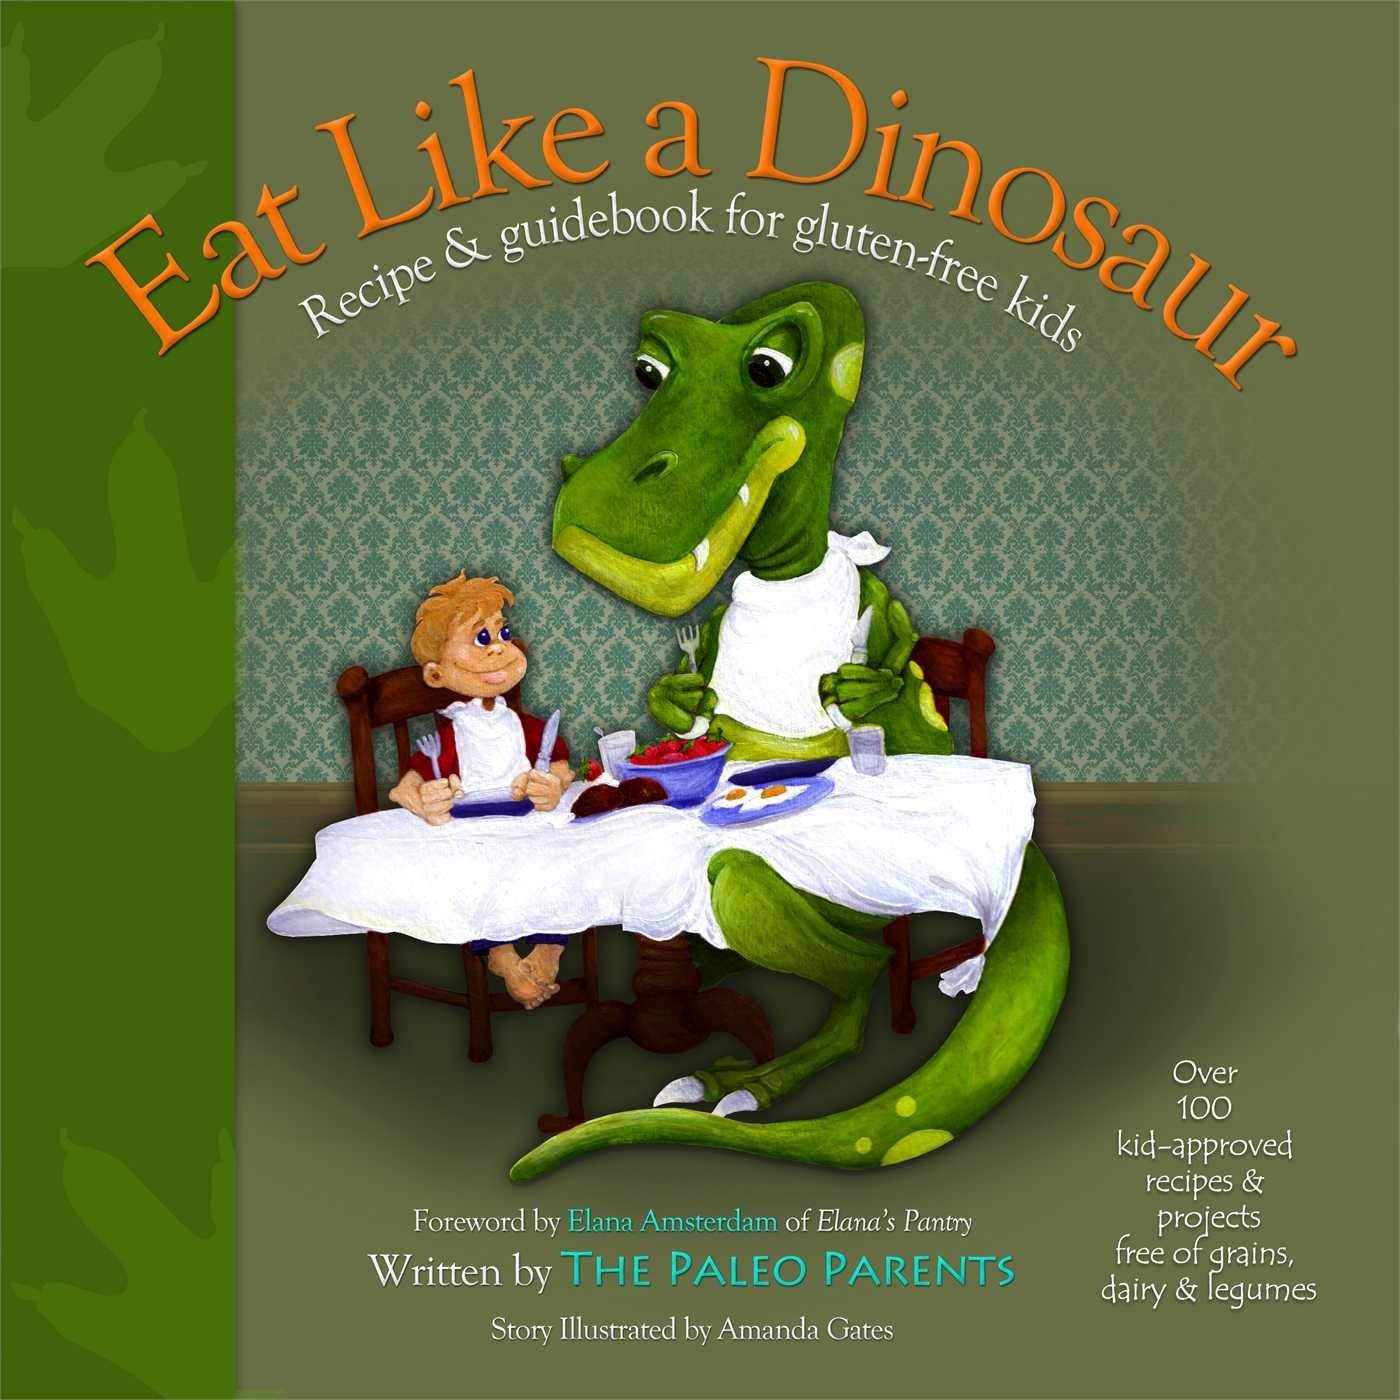 Eat Like a Dinosaur: Recipe & Guidebook for Gluten-free Kids by Victory Belt Publishing